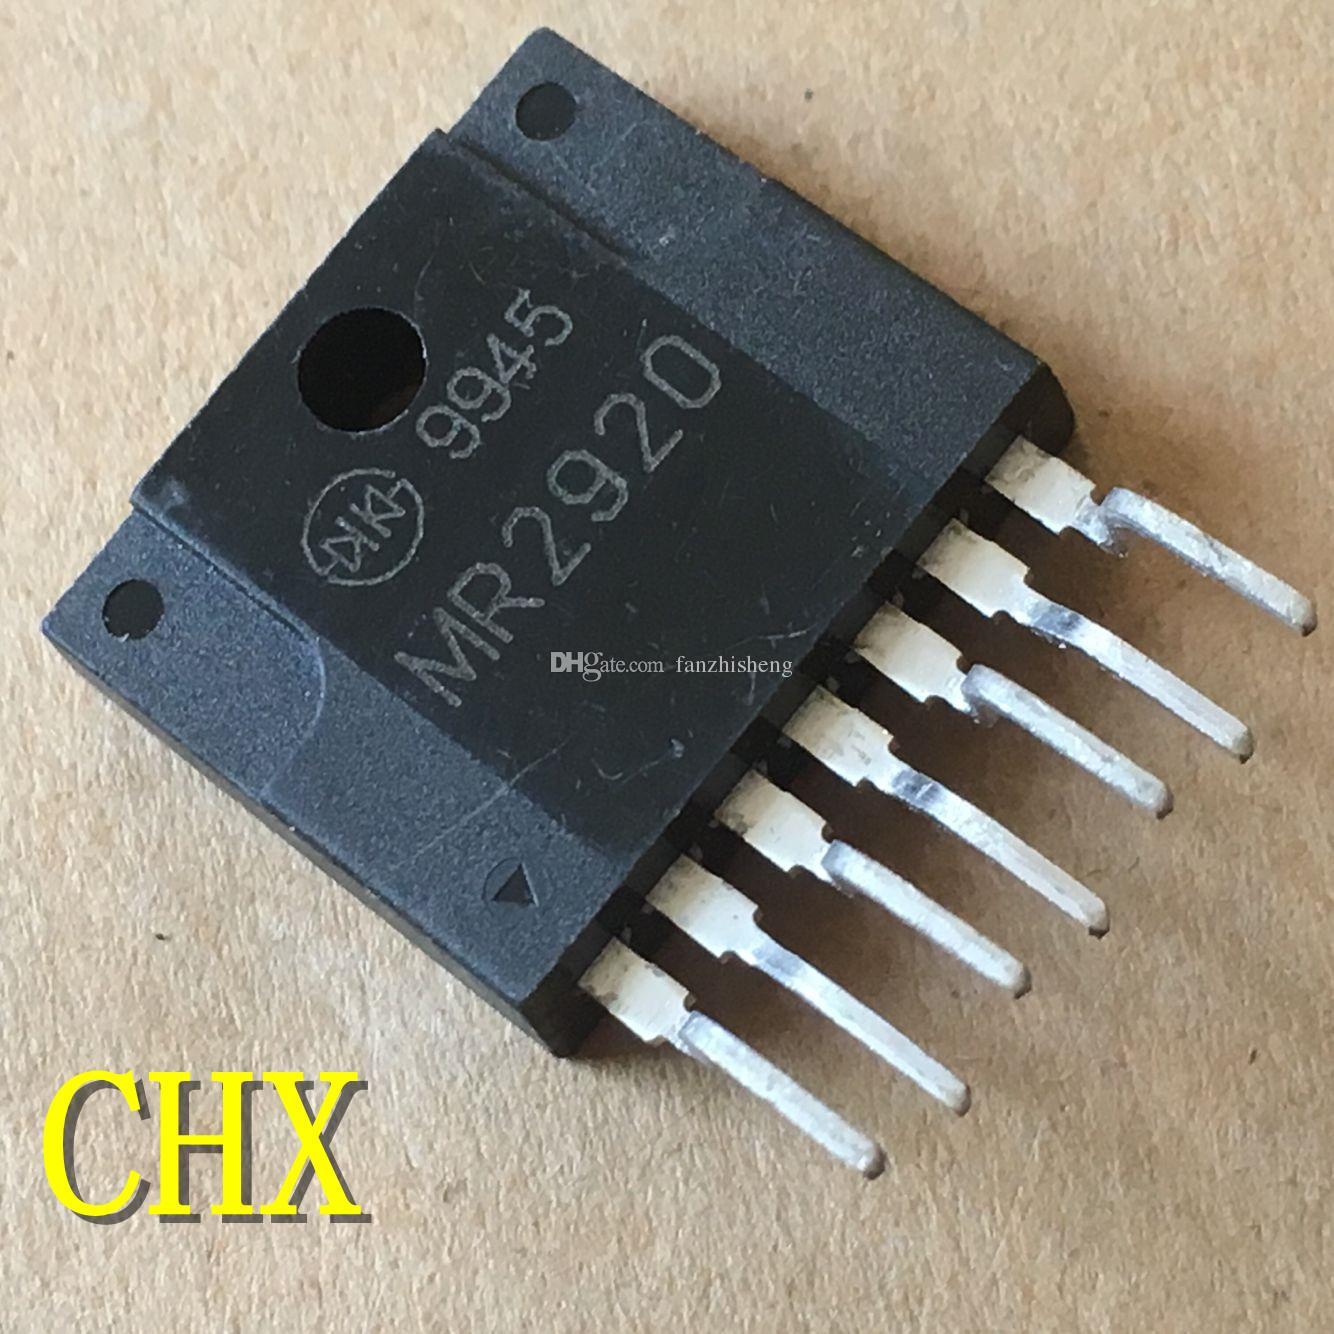 2 / adet IC TPD4103K TPD4104K TPD4104AK Yeni orijinal MR2920 HA13605 MSR5100-LF 16212886 TDA7490SA Kalite güvencesi oynayabilir